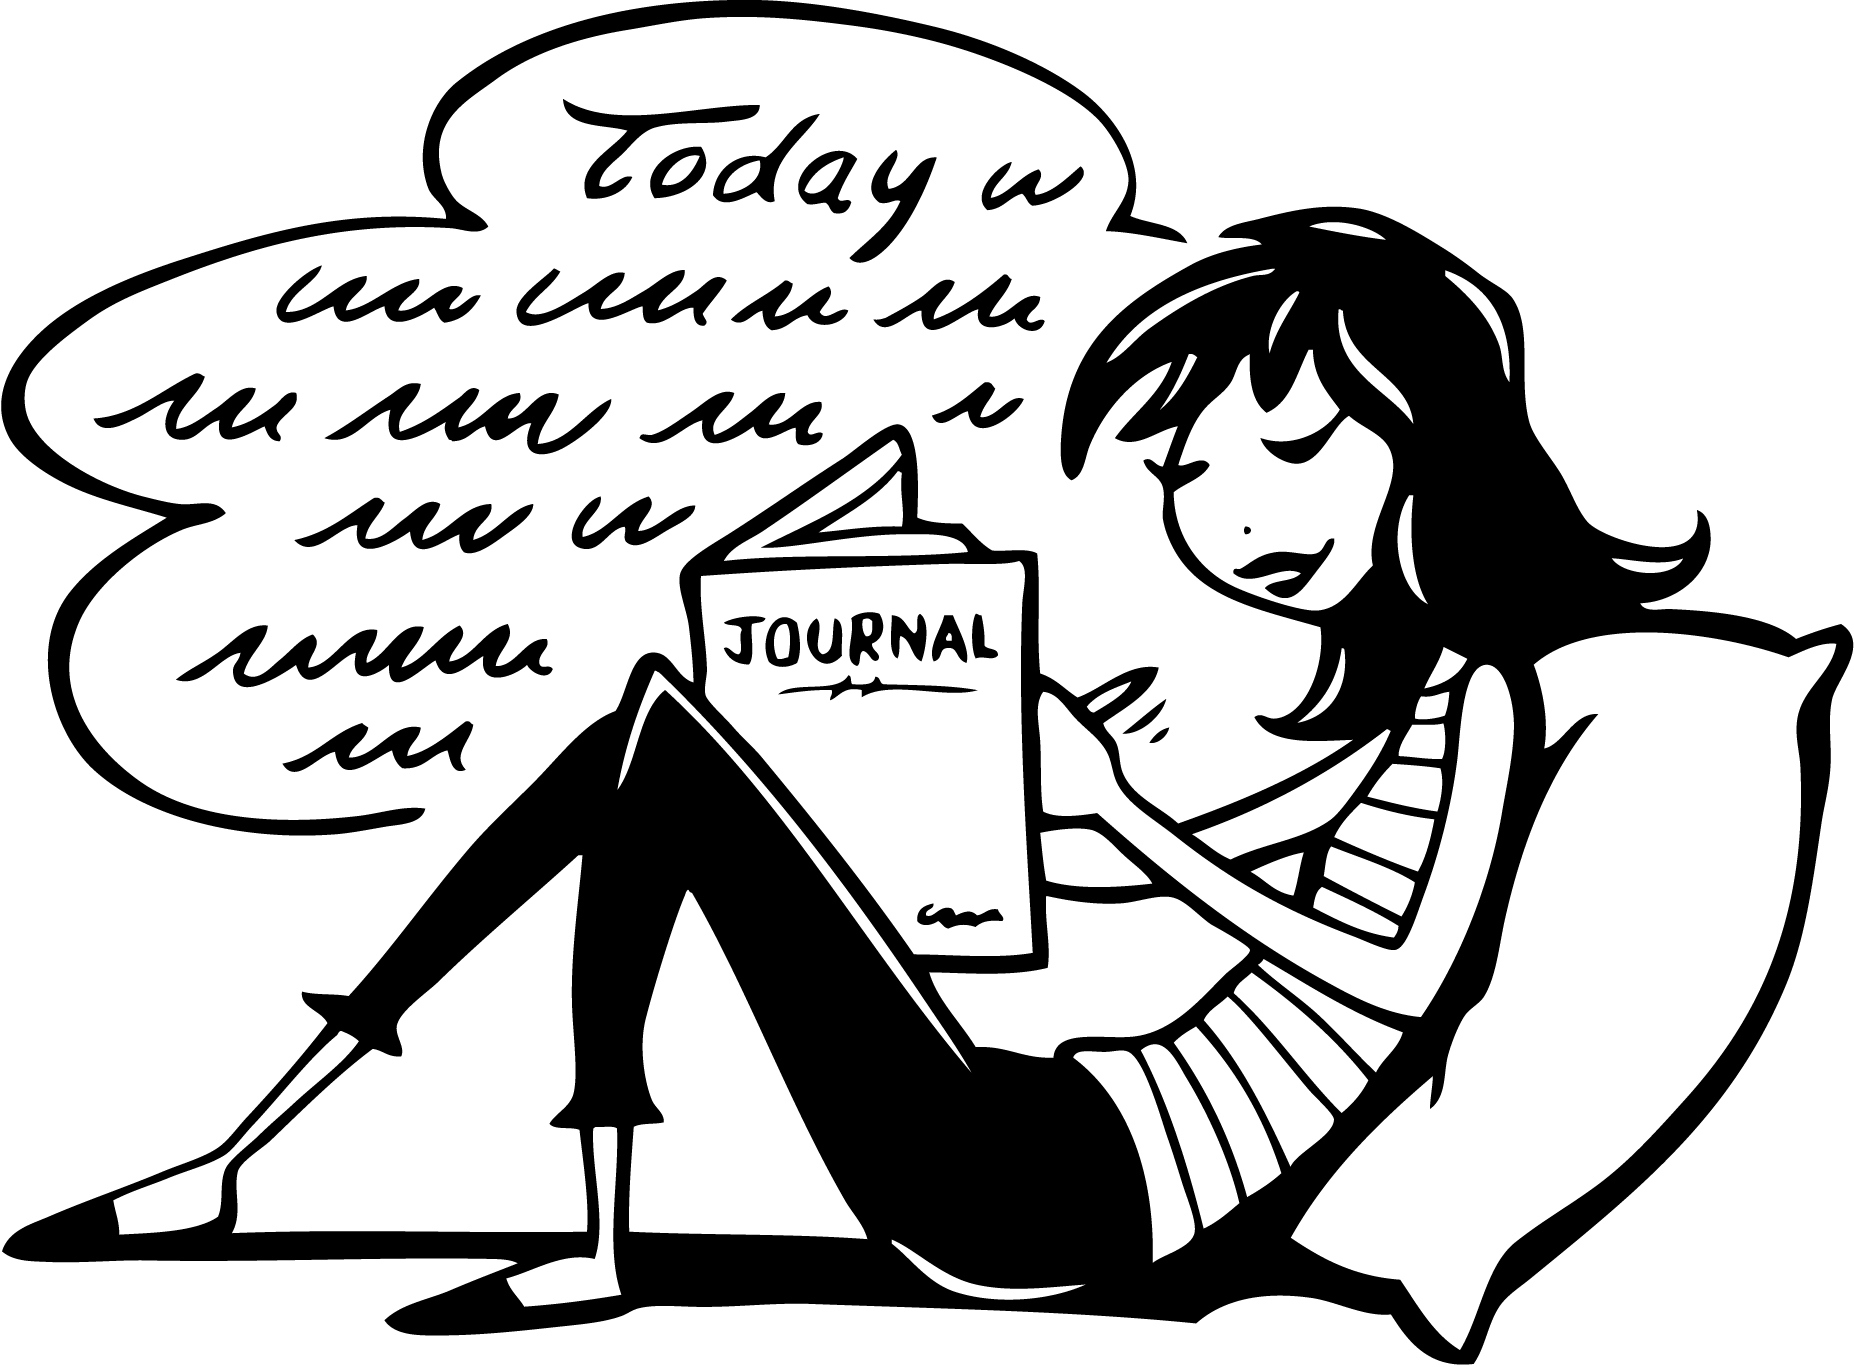 Headache Journal A Necessary Evil